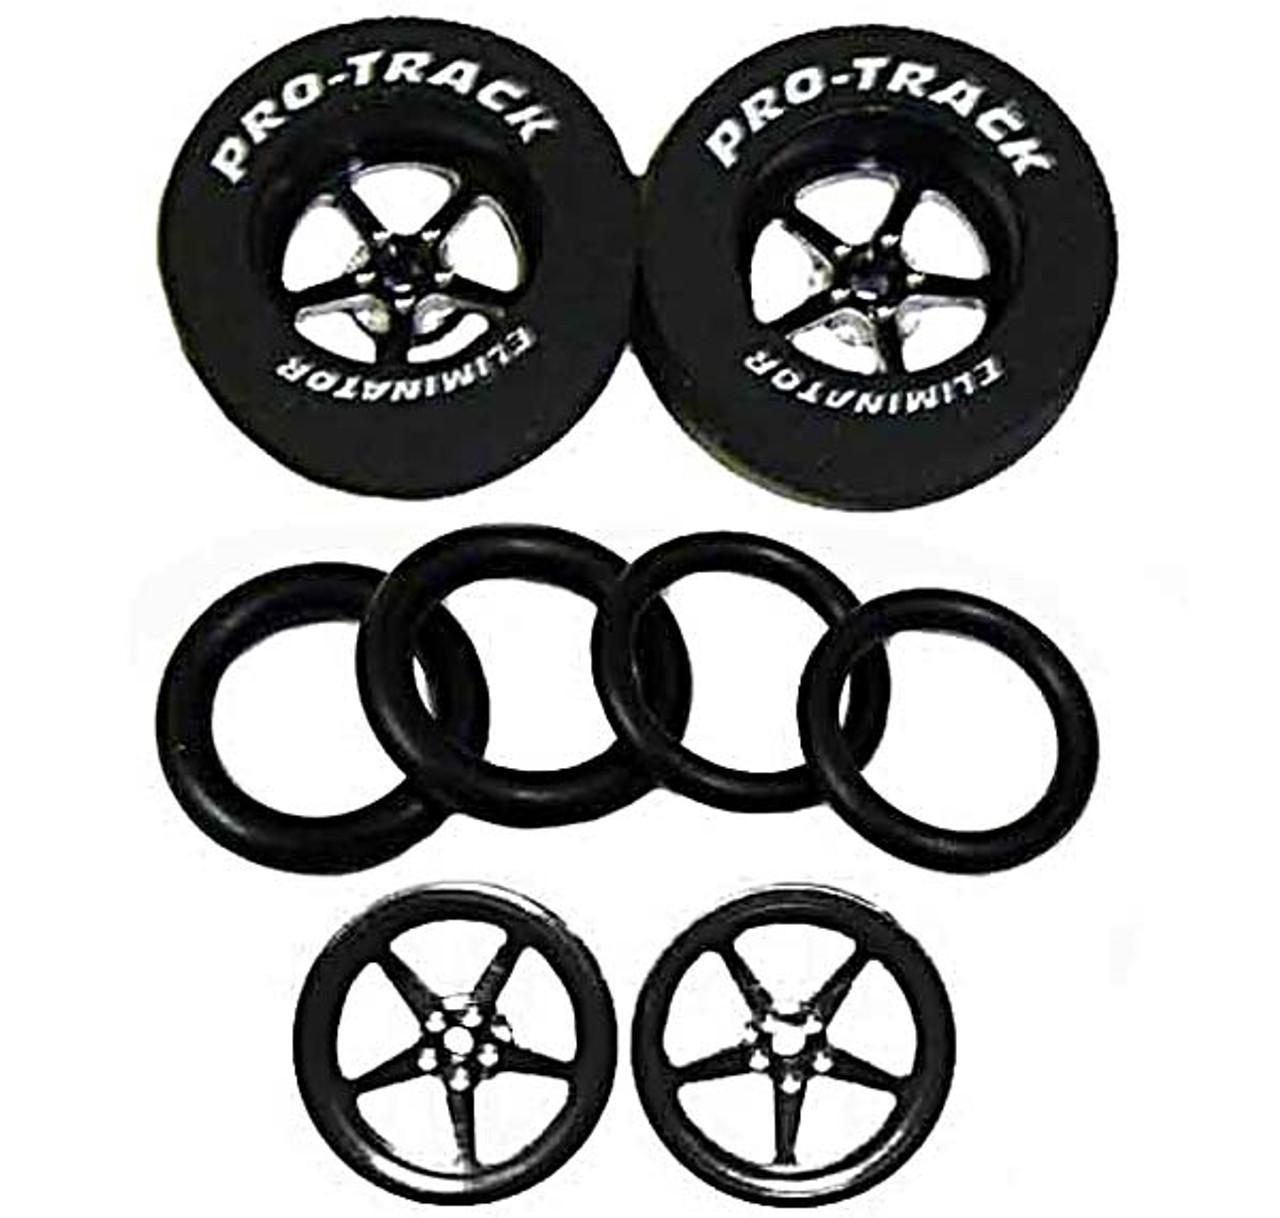 Pro-Track 1 1/16 x 3/32 x .435 wide Rears & Fronts - Style I - Black -PTC-N404I-BL-SET